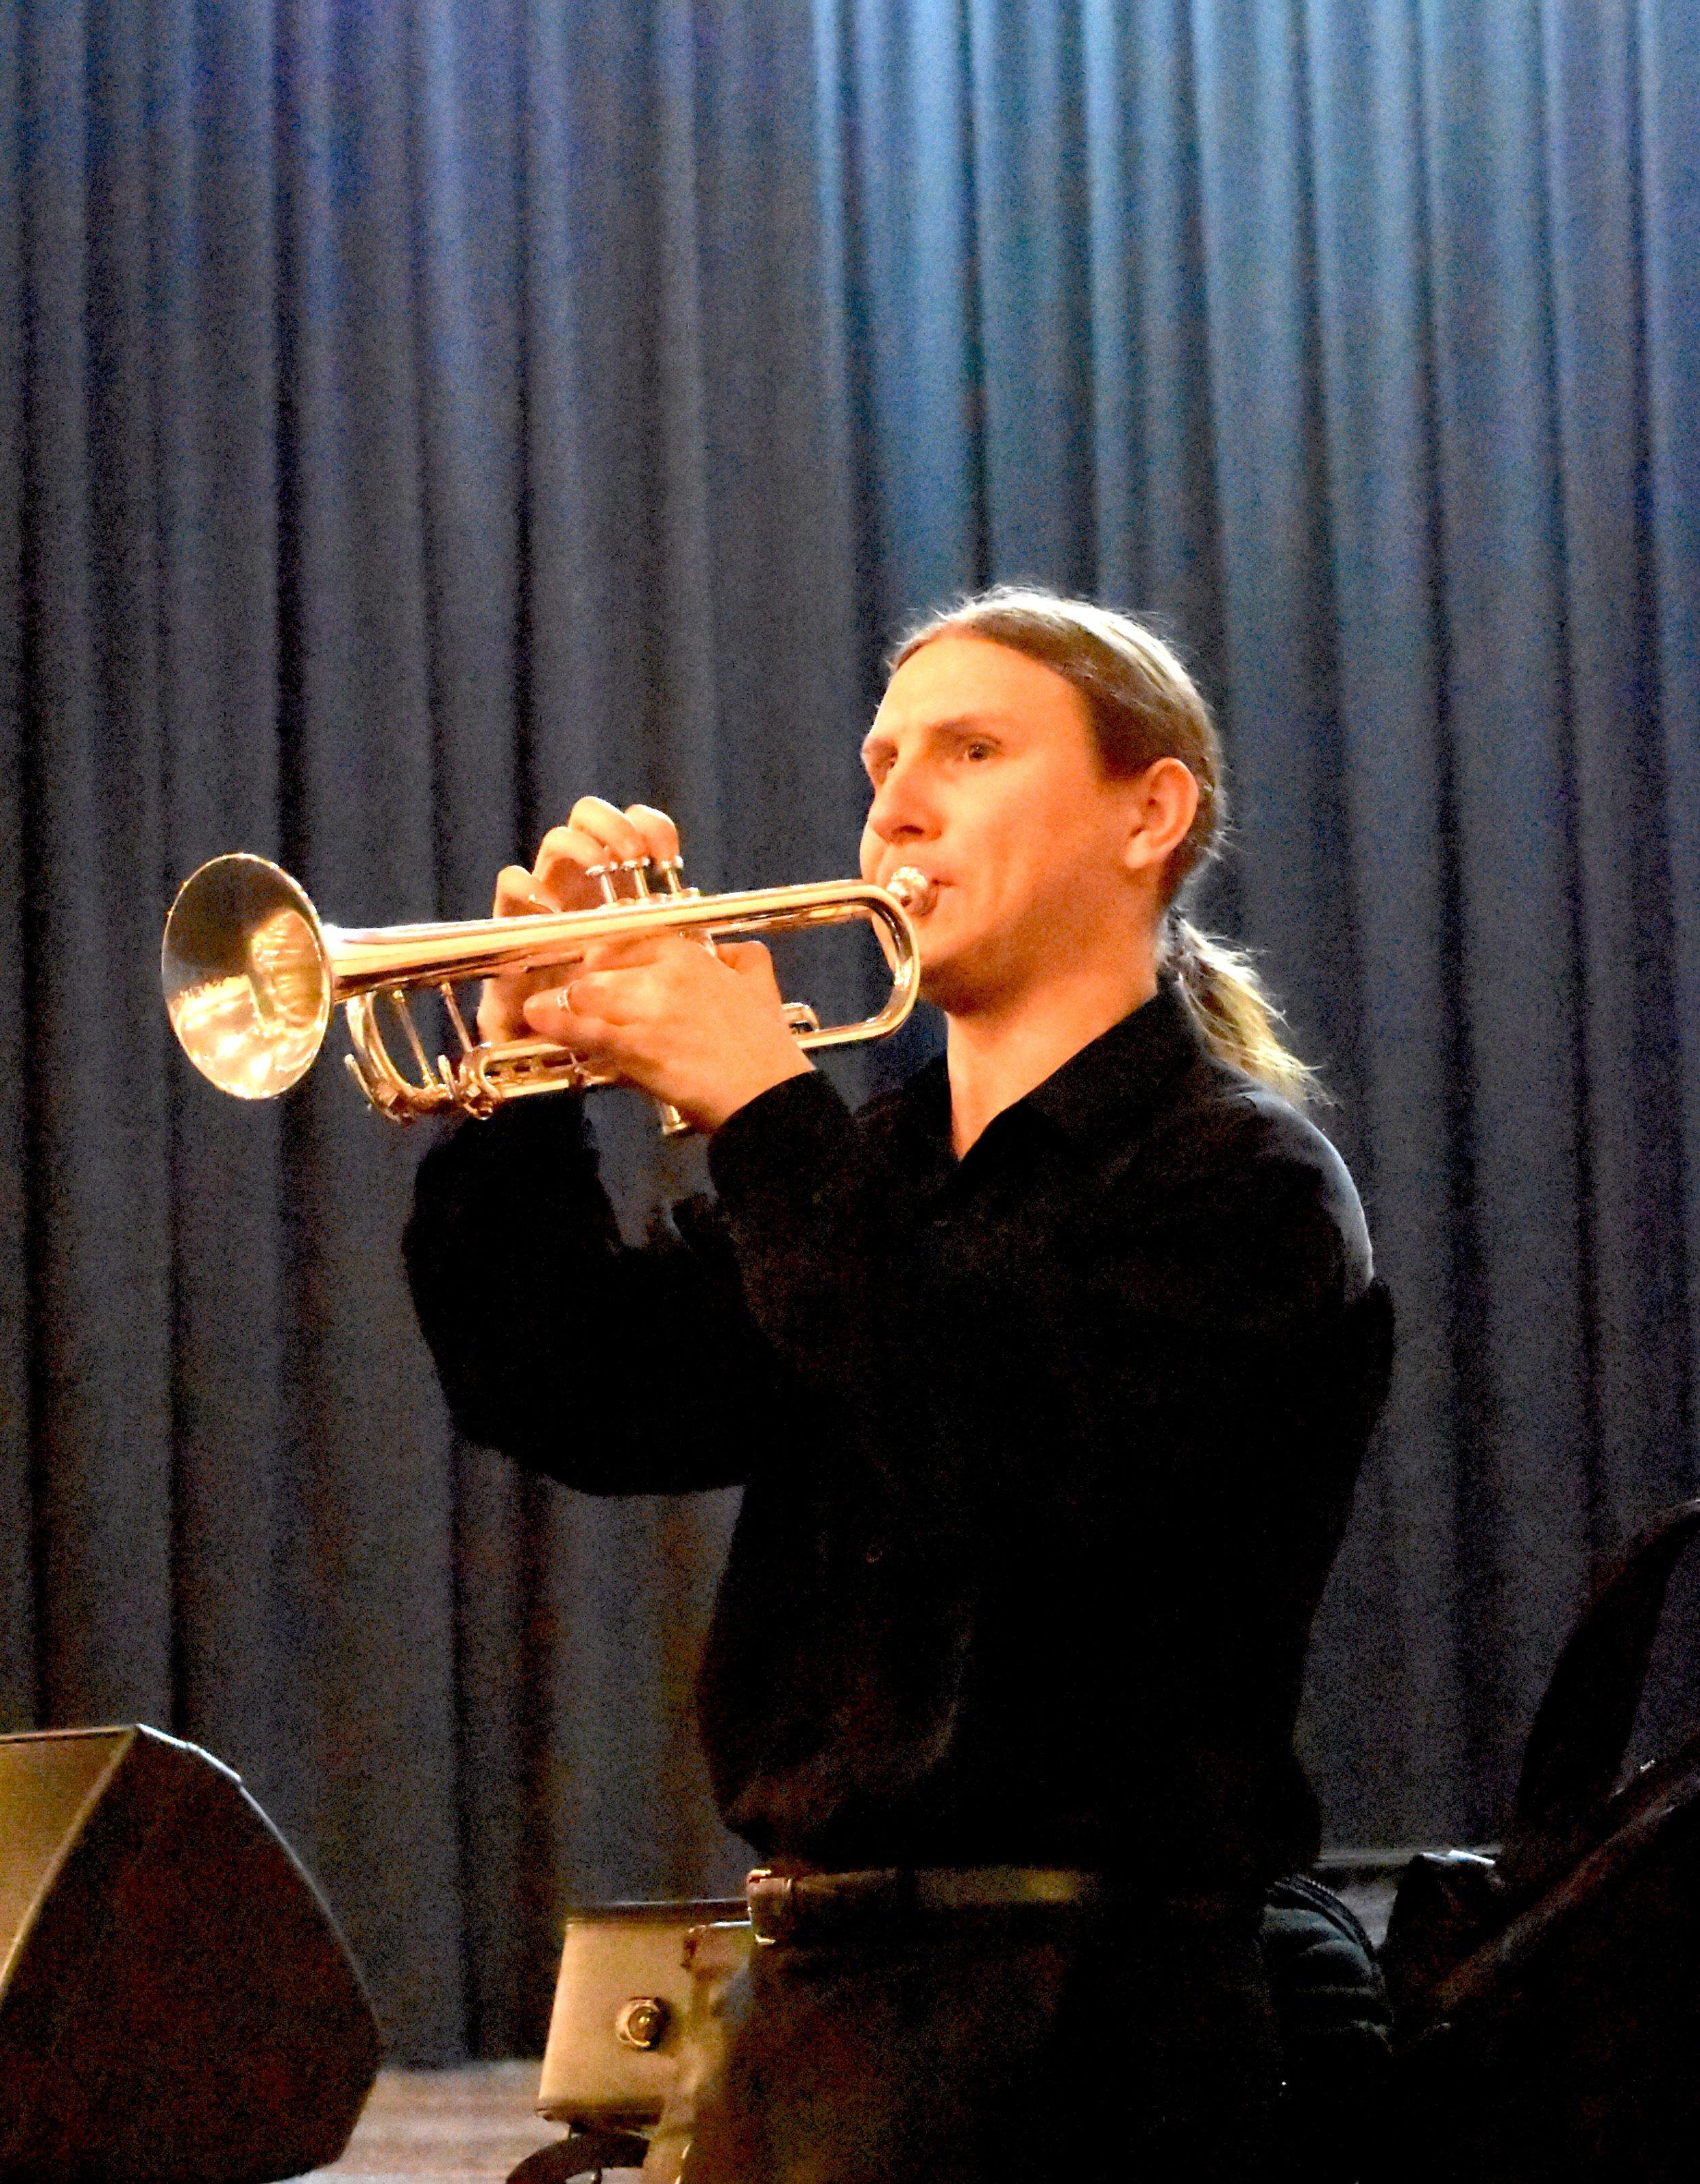 Tim trumpet.jpg